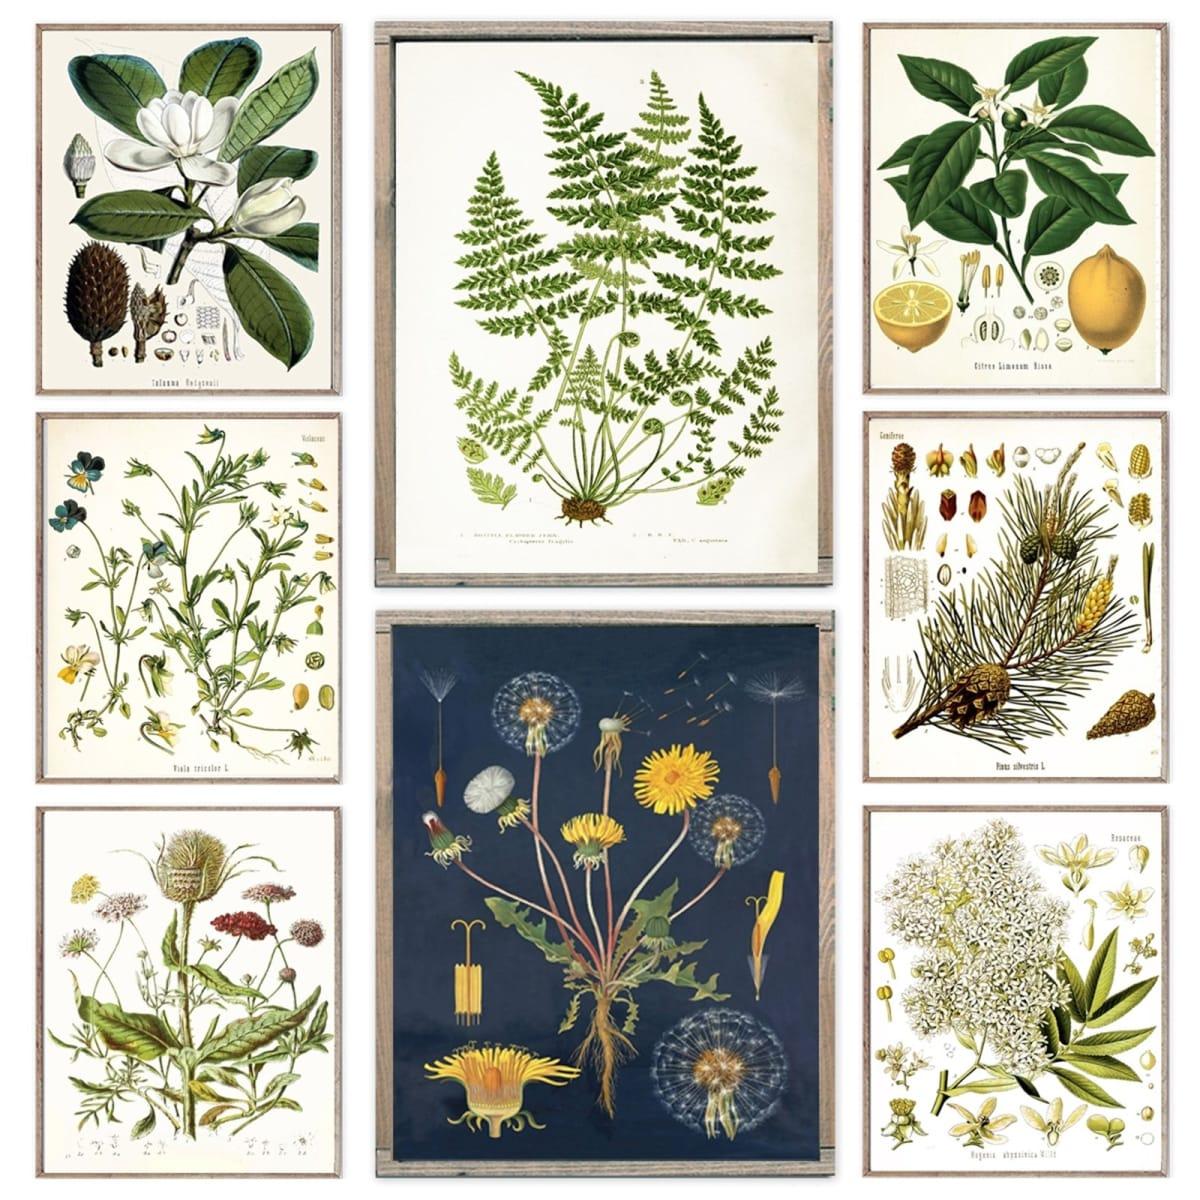 Rustic Botanical Illustrations